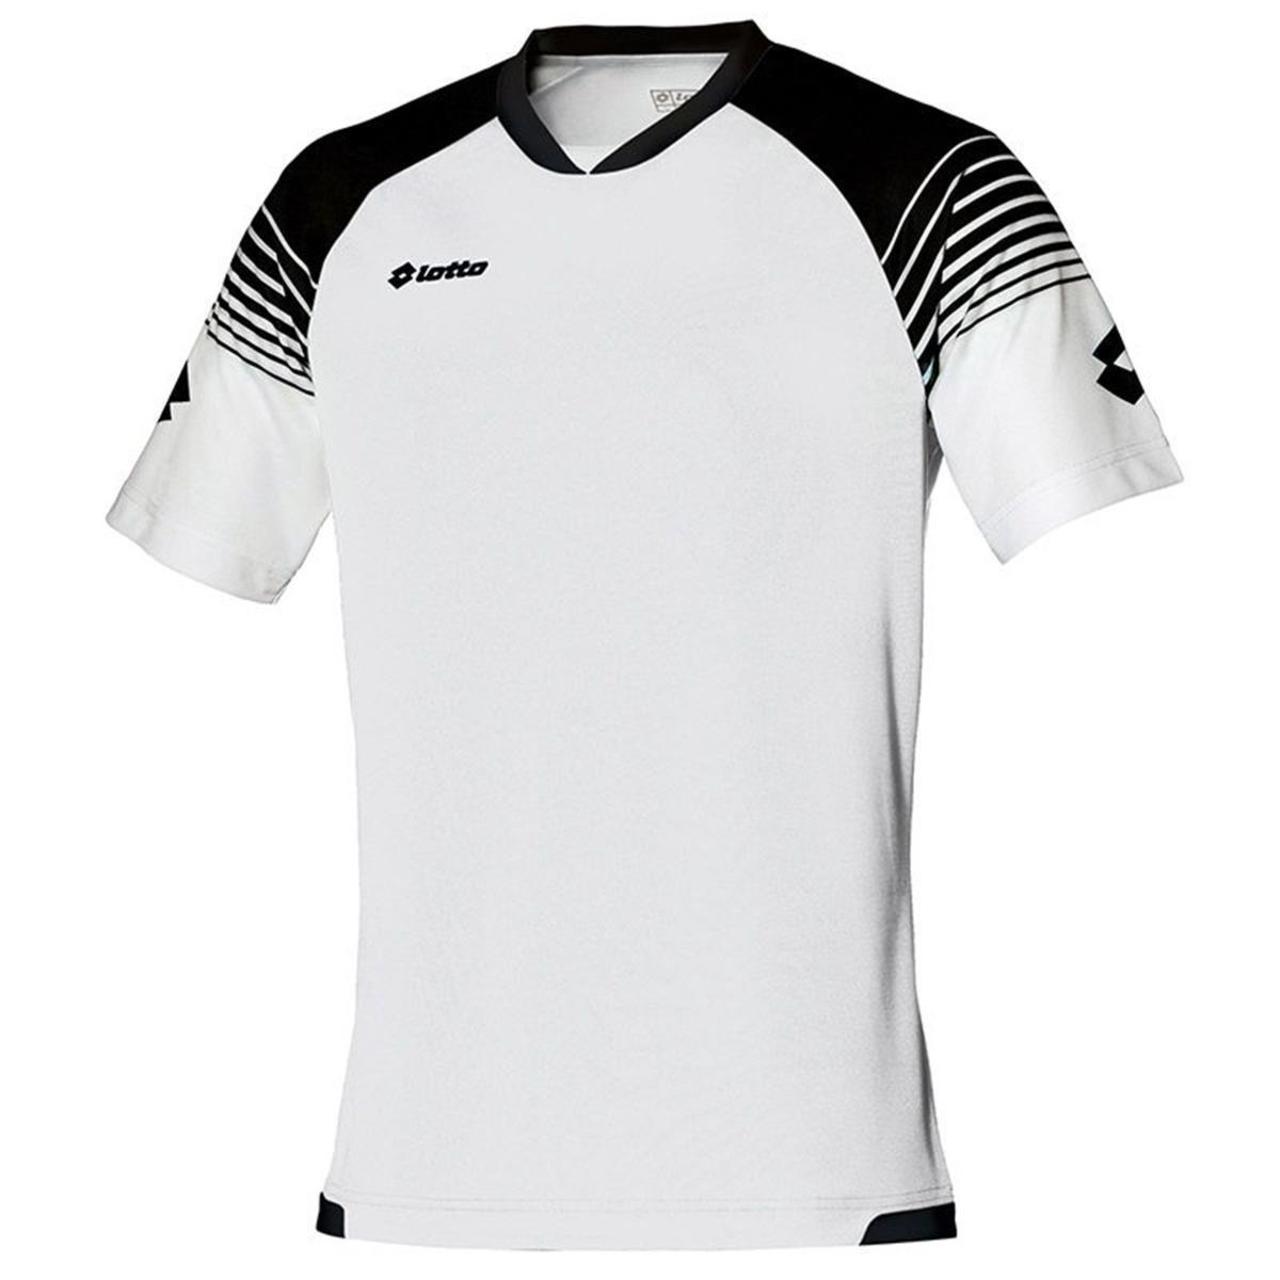 lotto football jersey innovative design classic v neck